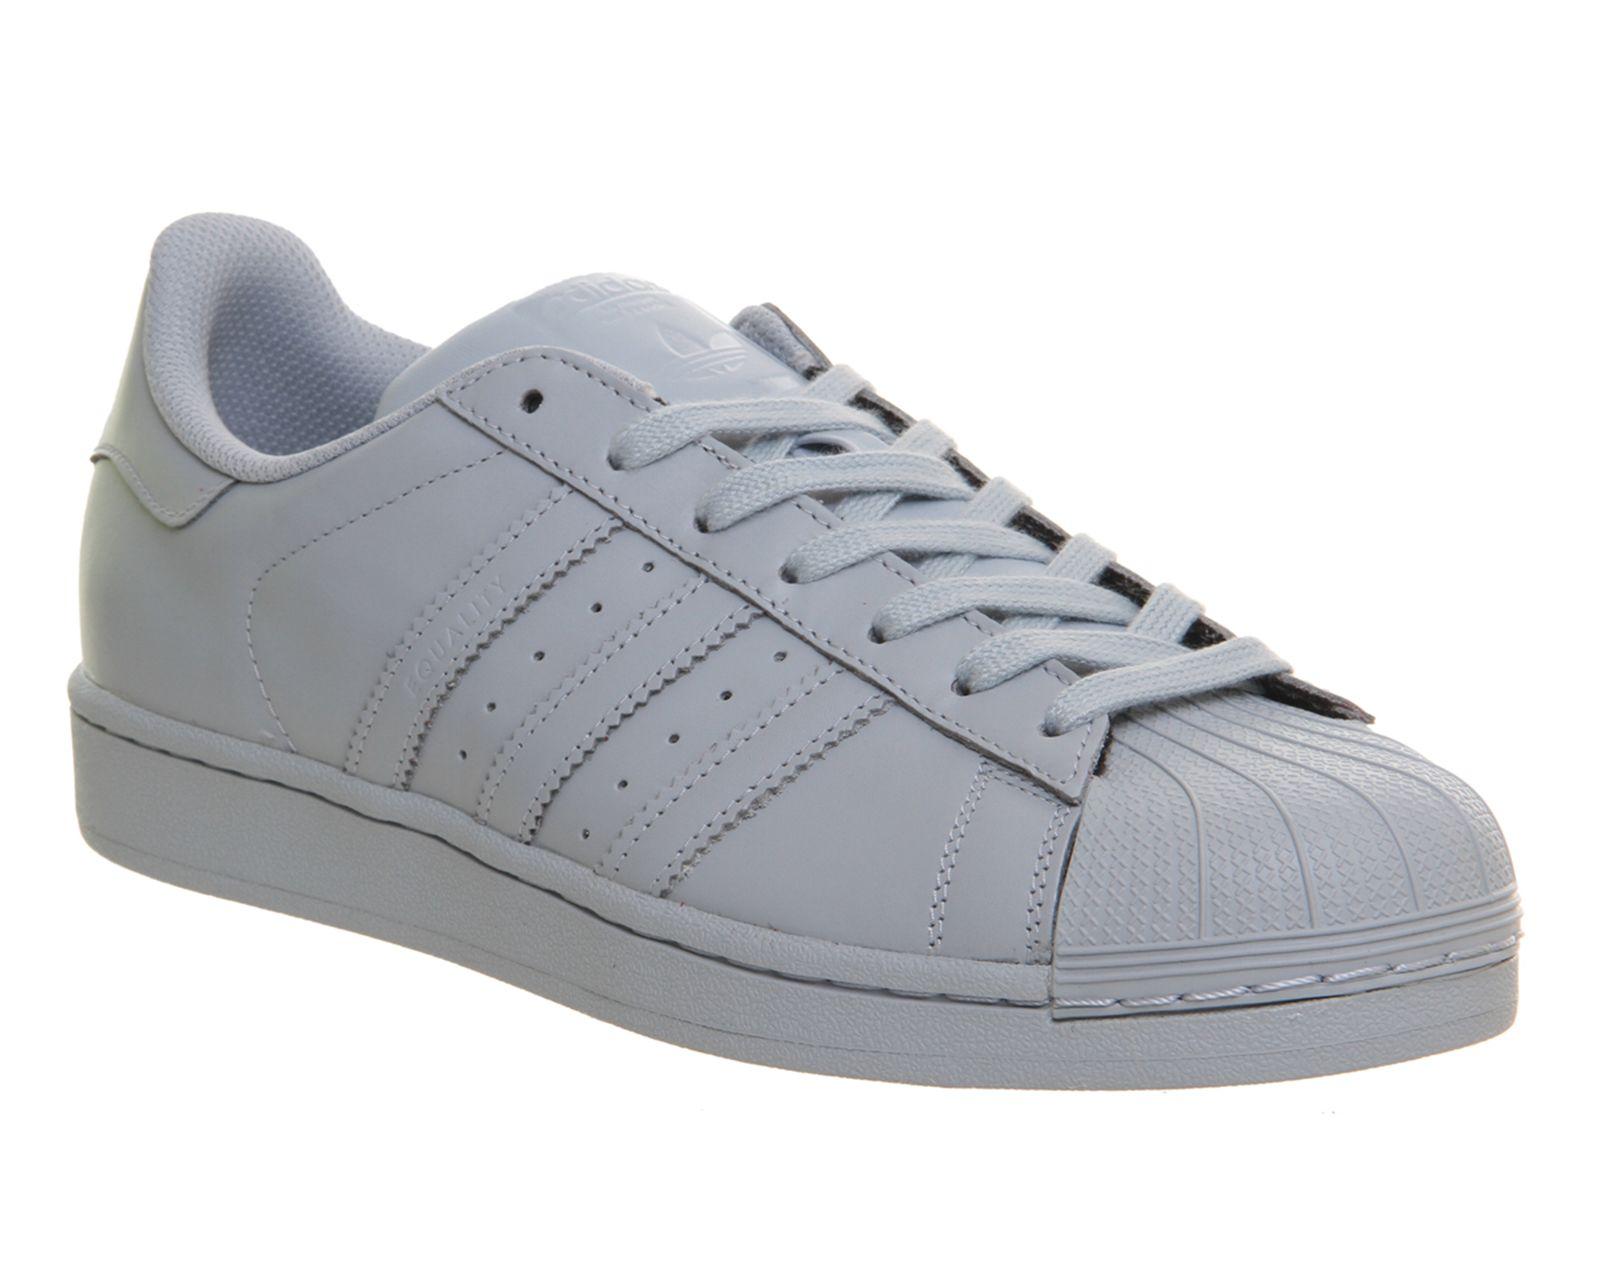 Adidas superstar 1, pharrell supercolor haze della lista